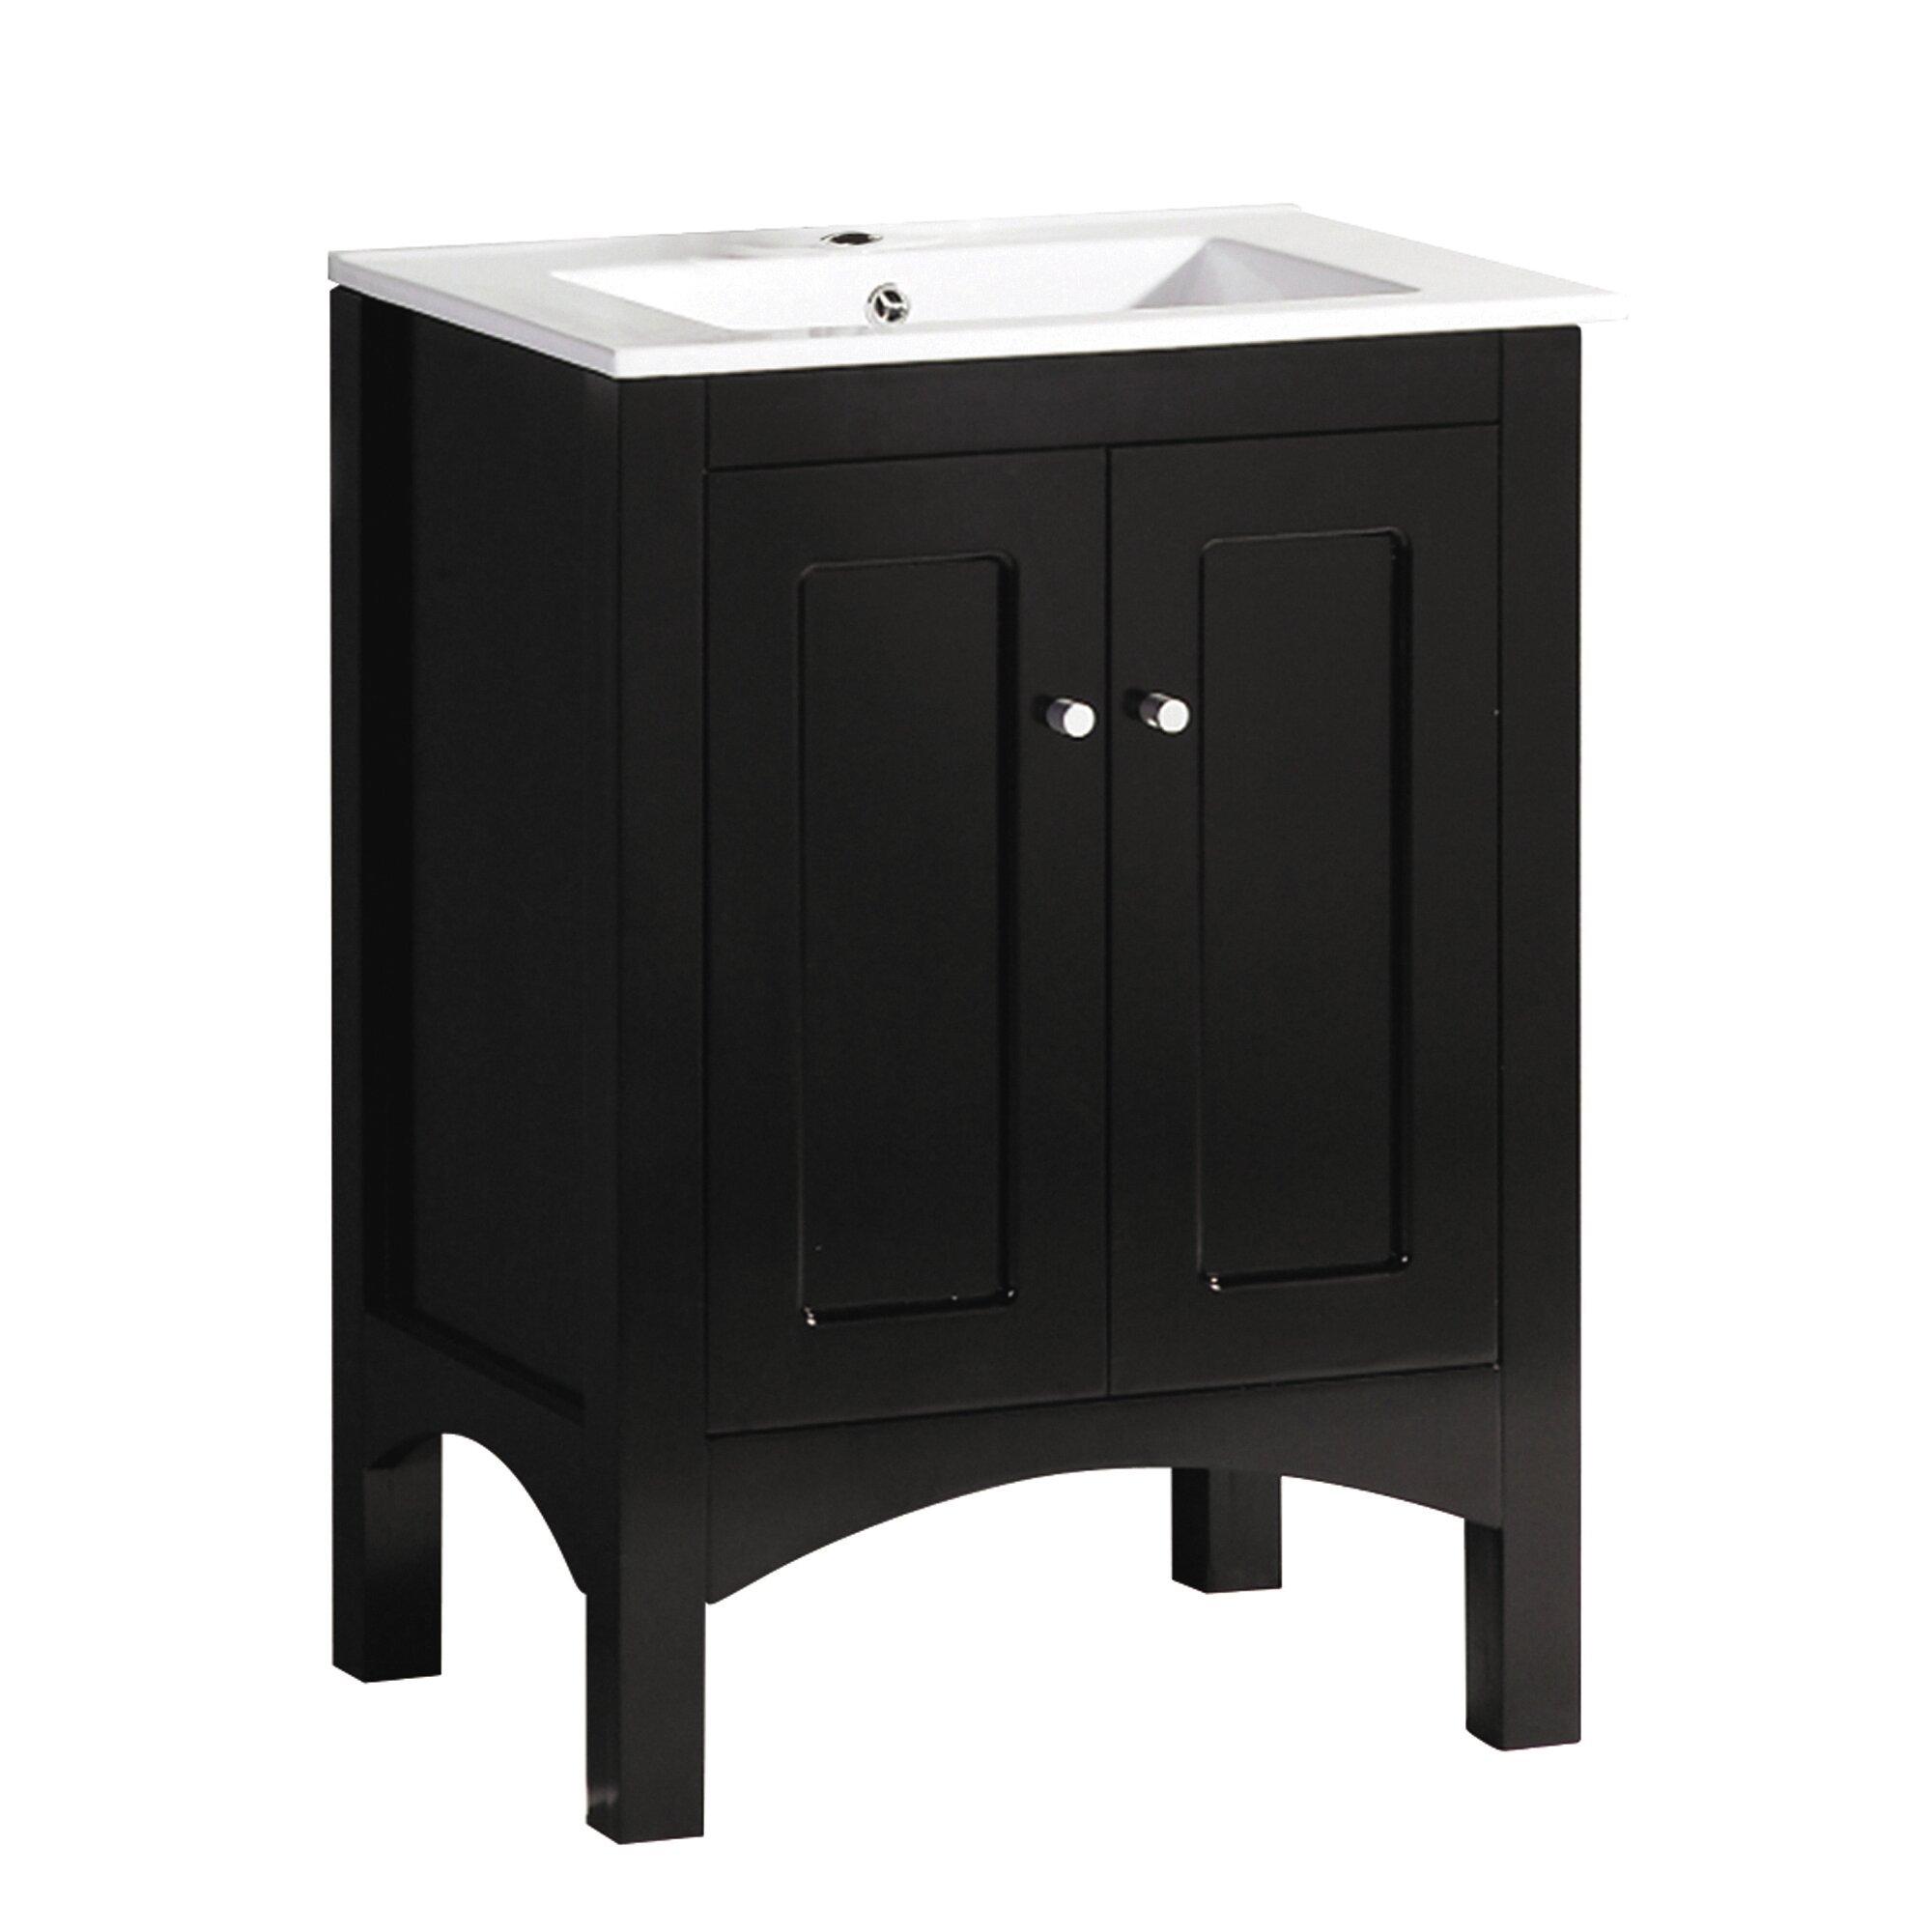 yosemite home decor 24 single bathroom vanity set